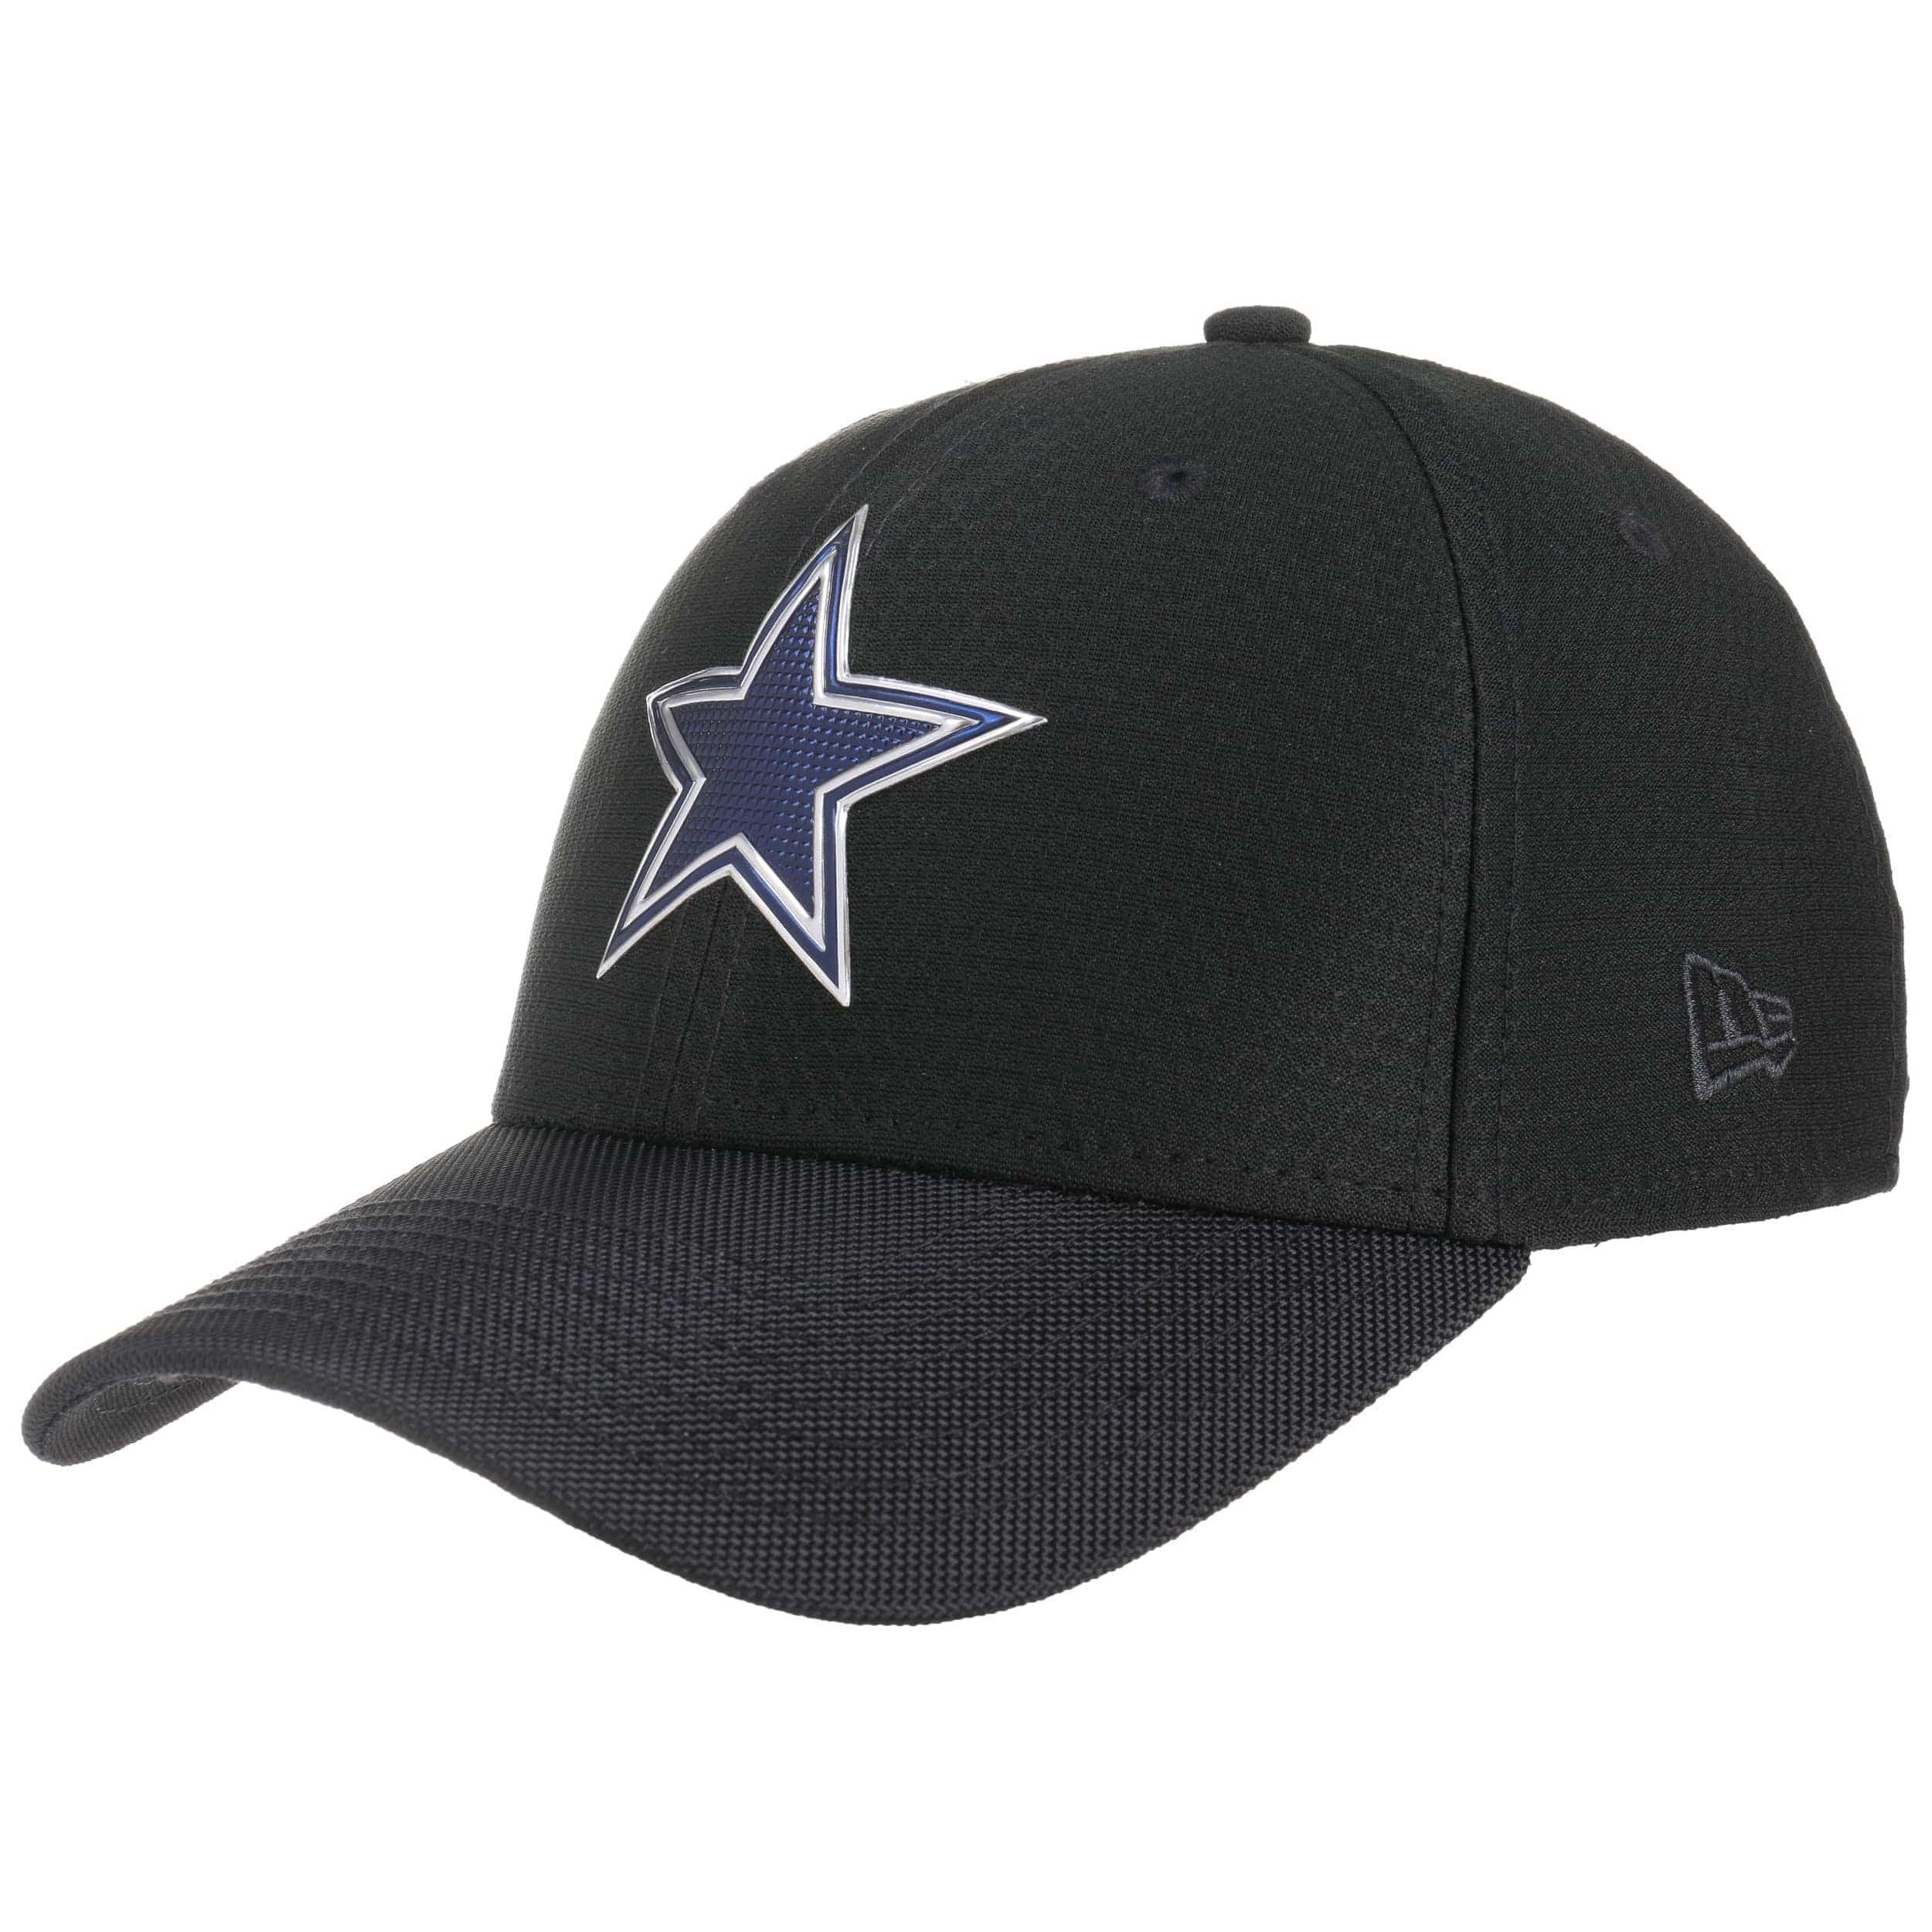 39Thirty NFL Coll Cowboys Cap by New Era, EUR 34,95 gt; Hats, caps  beanies shop online